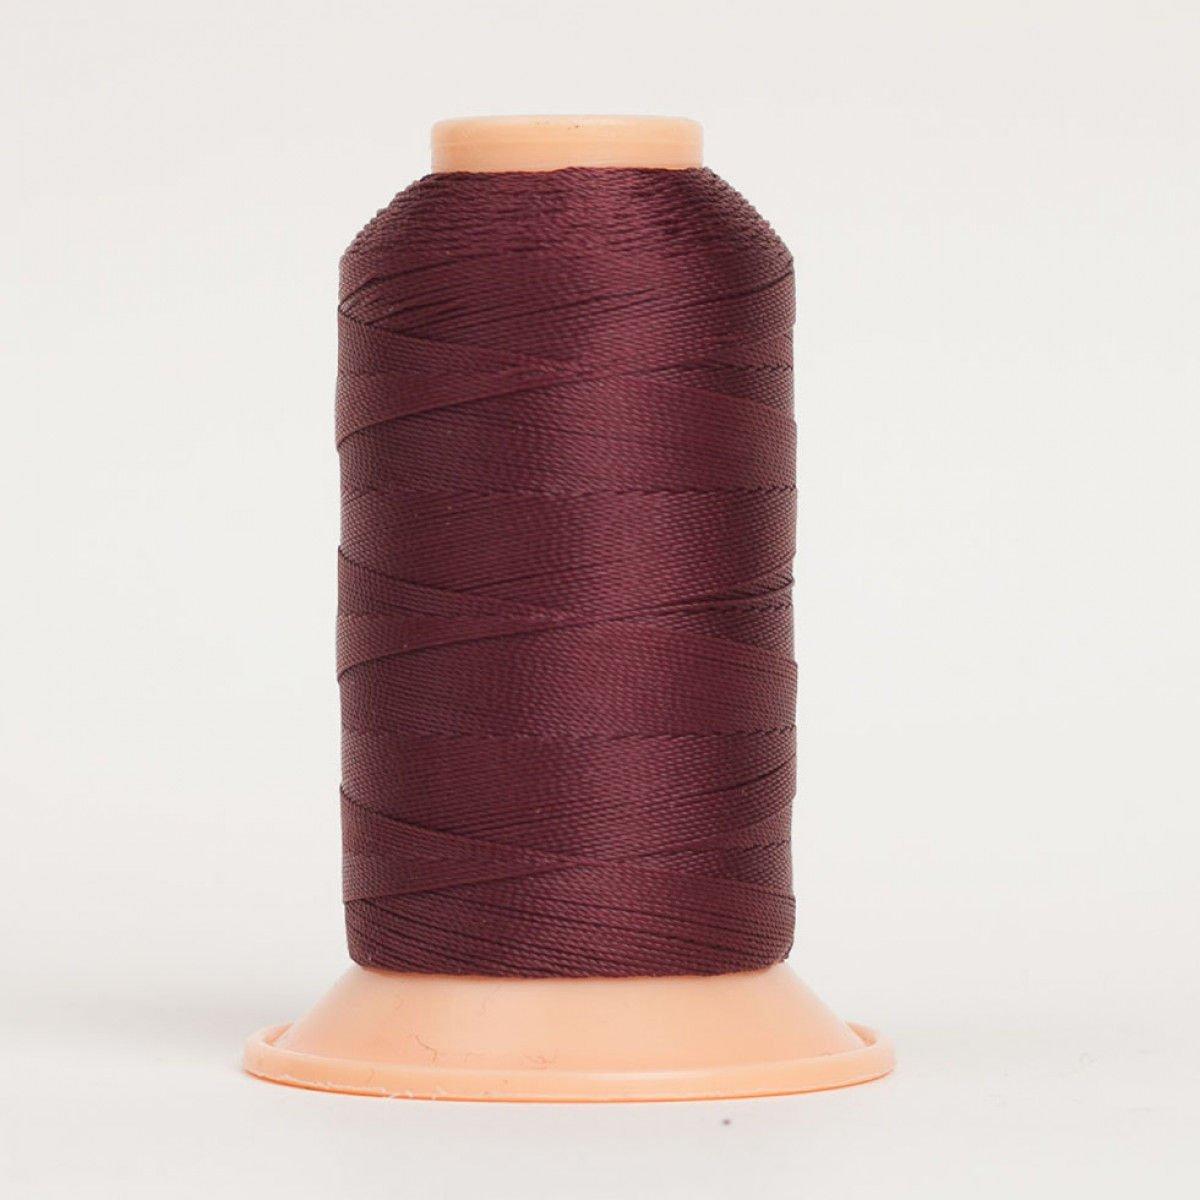 Col.369 Upholstery Thread 300m/328yds Burgundy